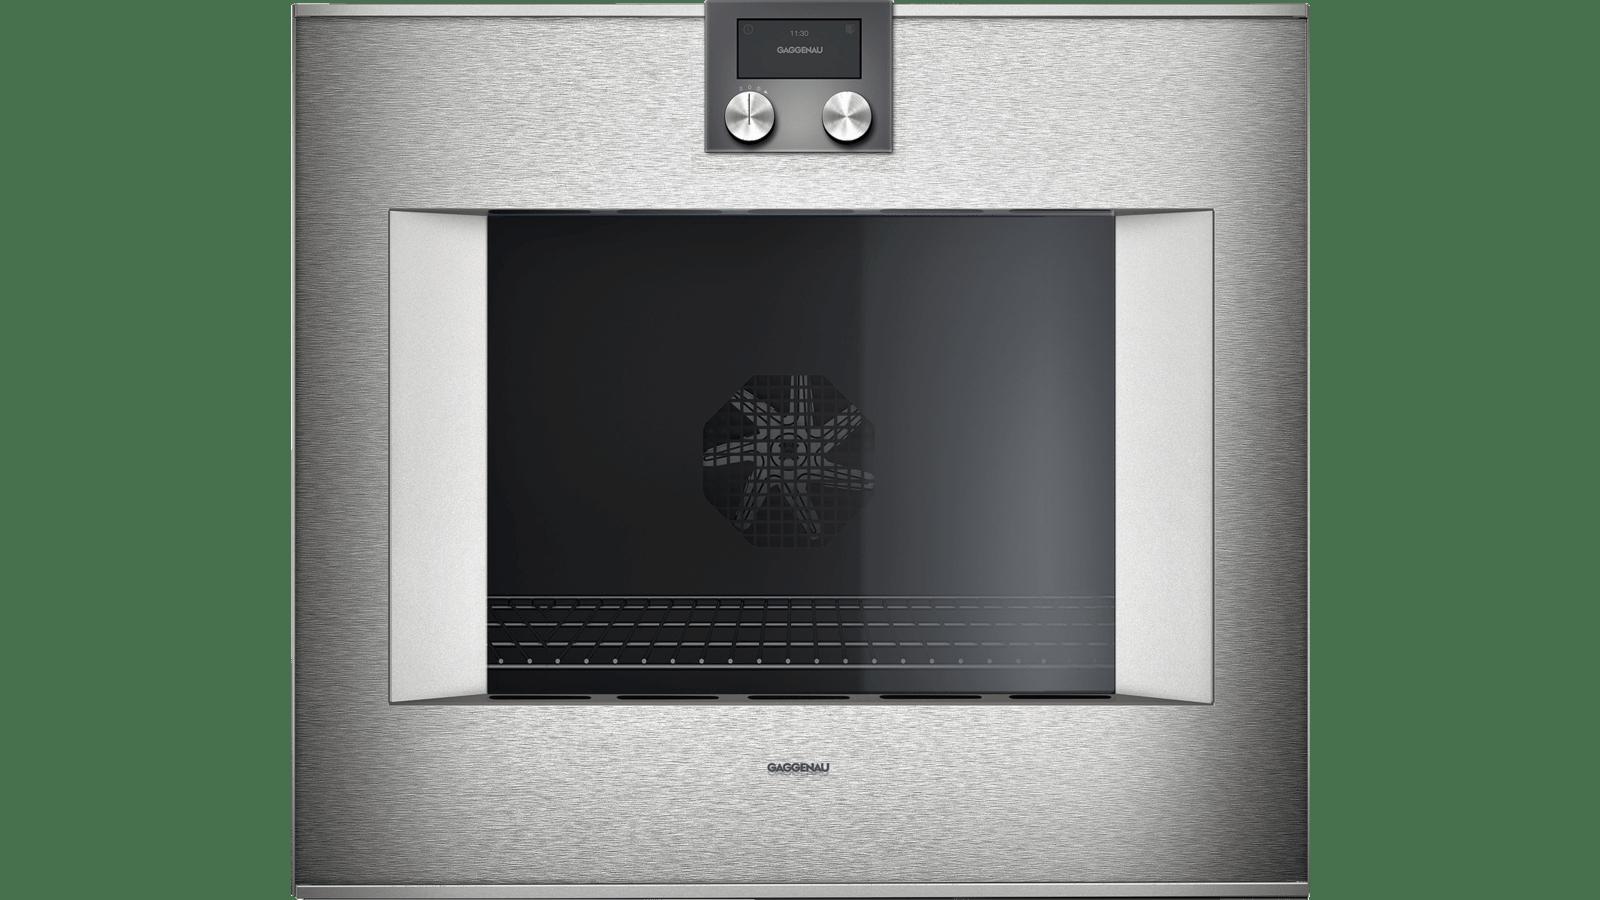 Gaggenau Bo480611 Oven